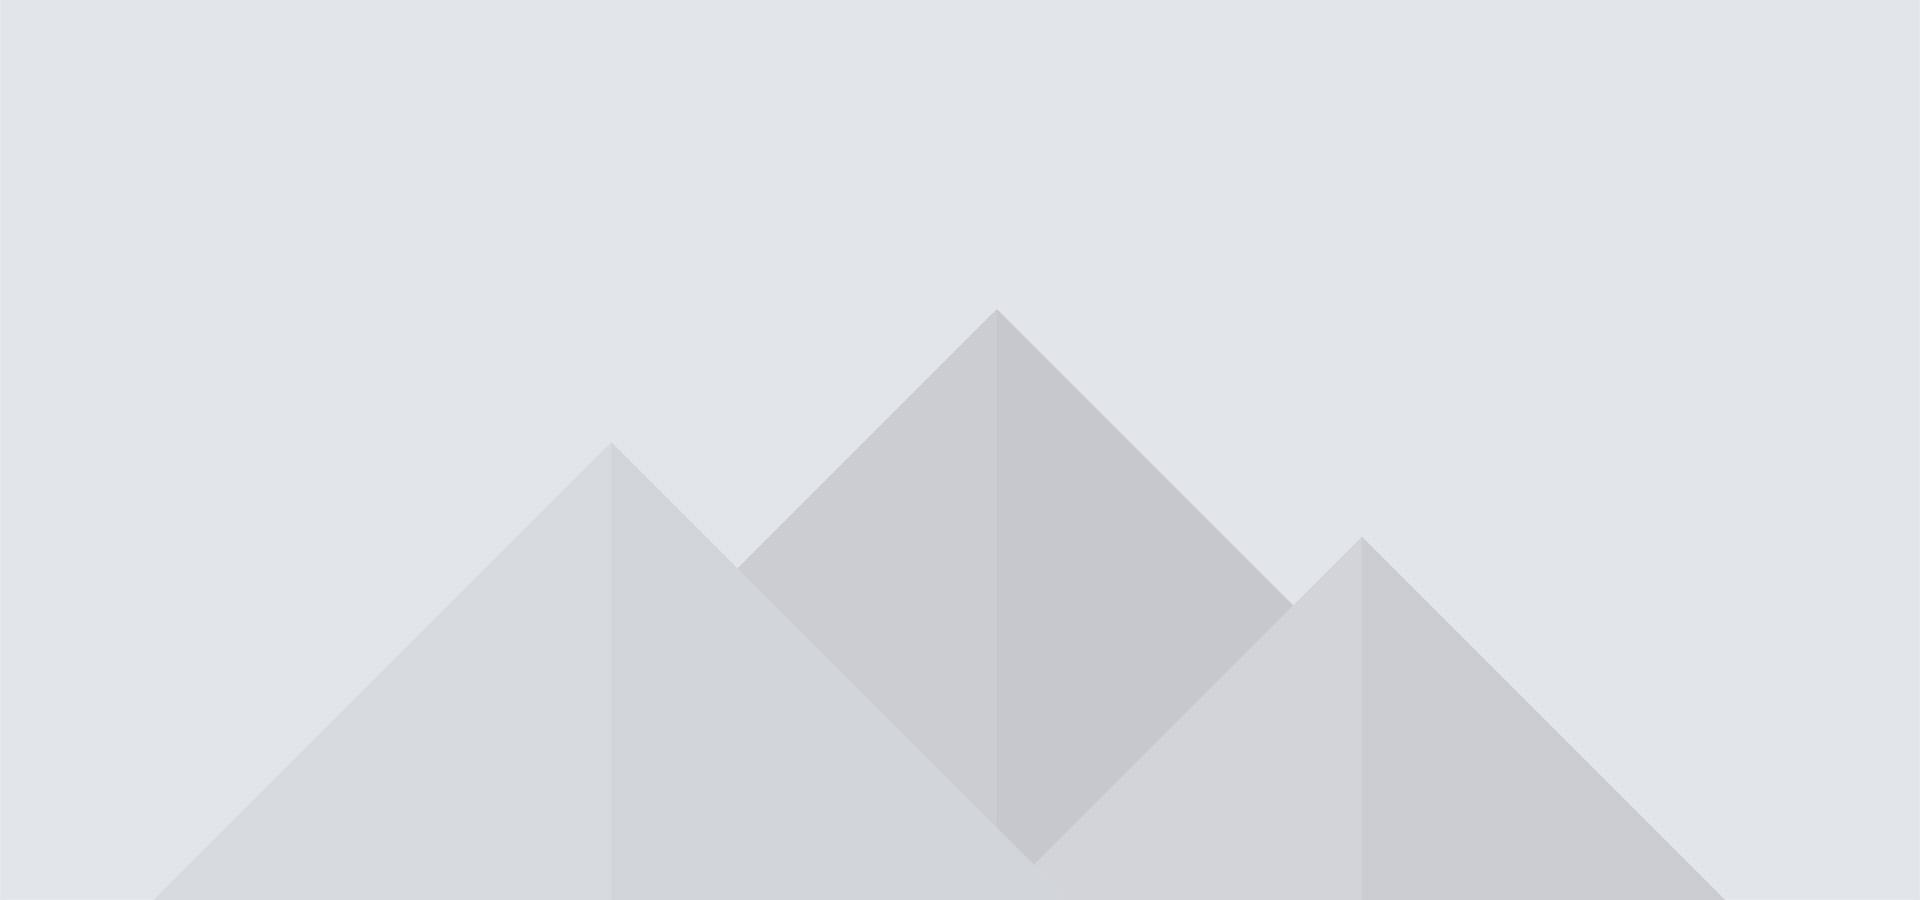 Best Practices for Animated Progress Indicators